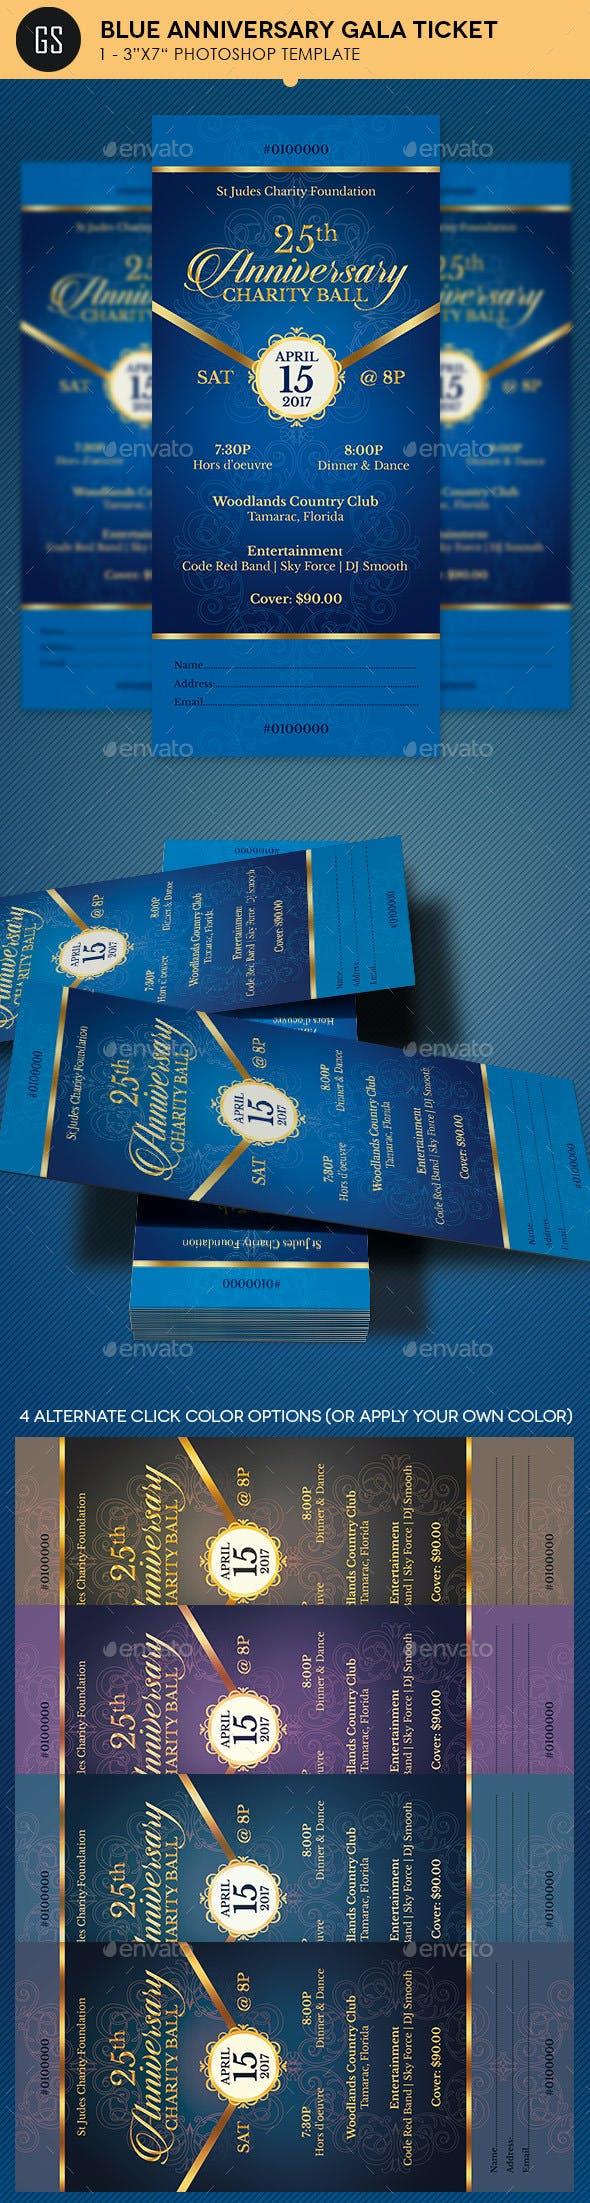 Blue Anniversary Gala Ticket Template